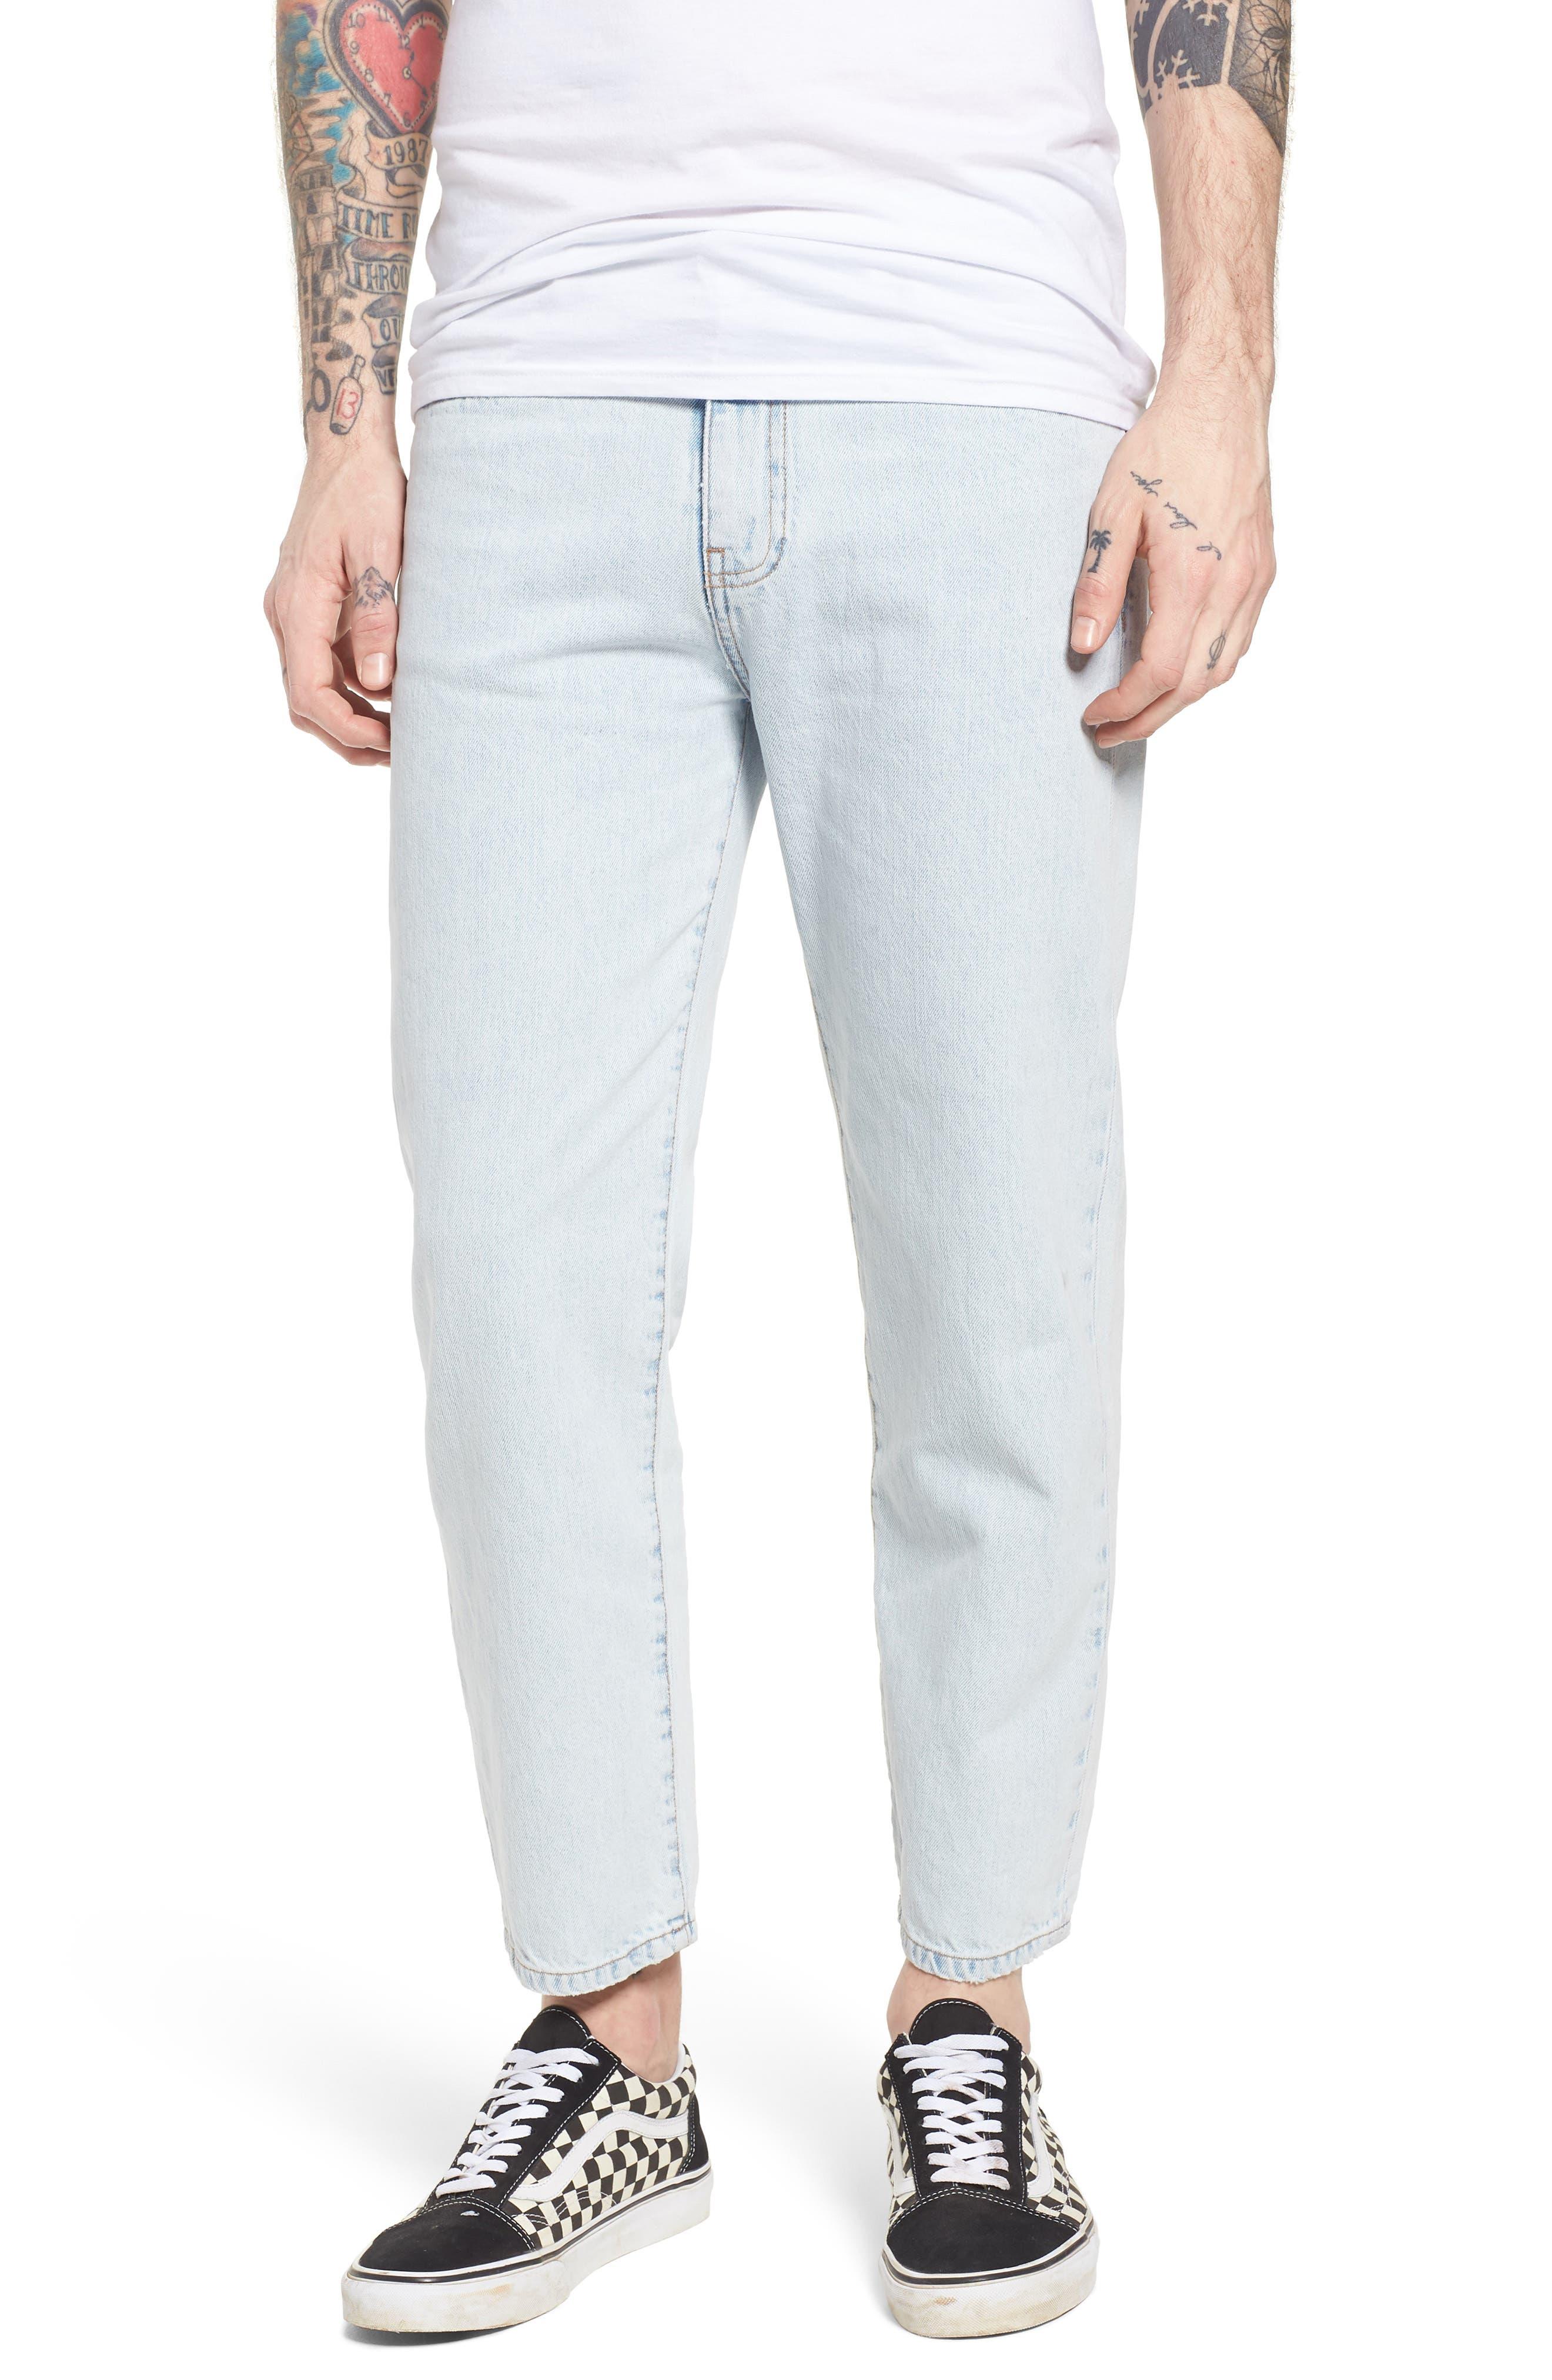 Otis Straight Fit Jeans,                         Main,                         color, 401